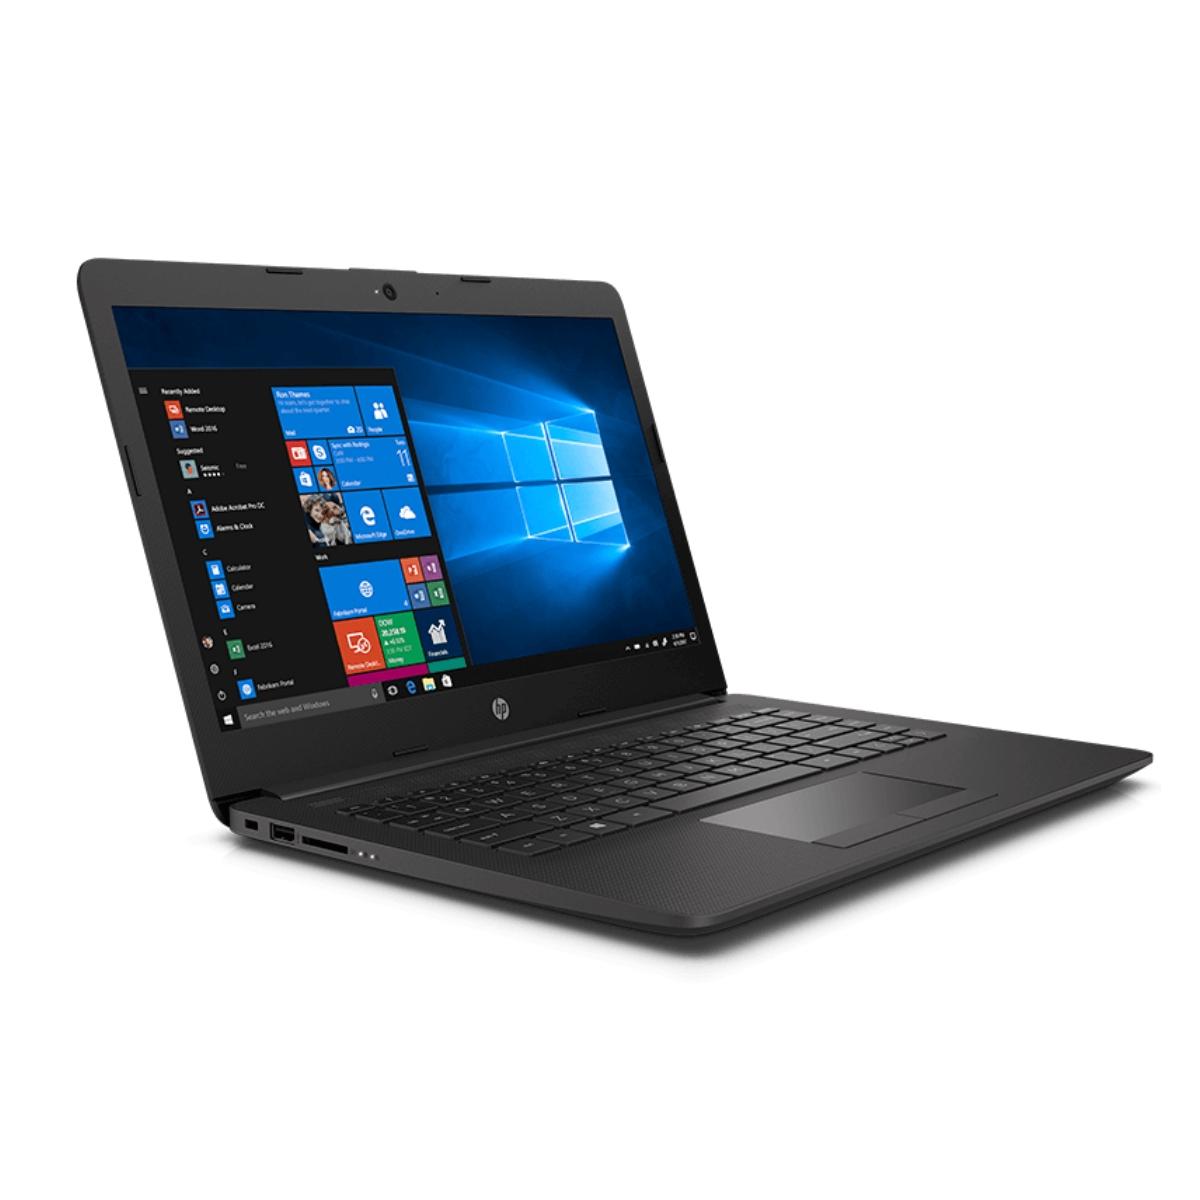 "Laptop HP 240 G7 i3-1005G1 4GB RAM + 1TB 14"" Win10 Home - Kemik Guatemala"